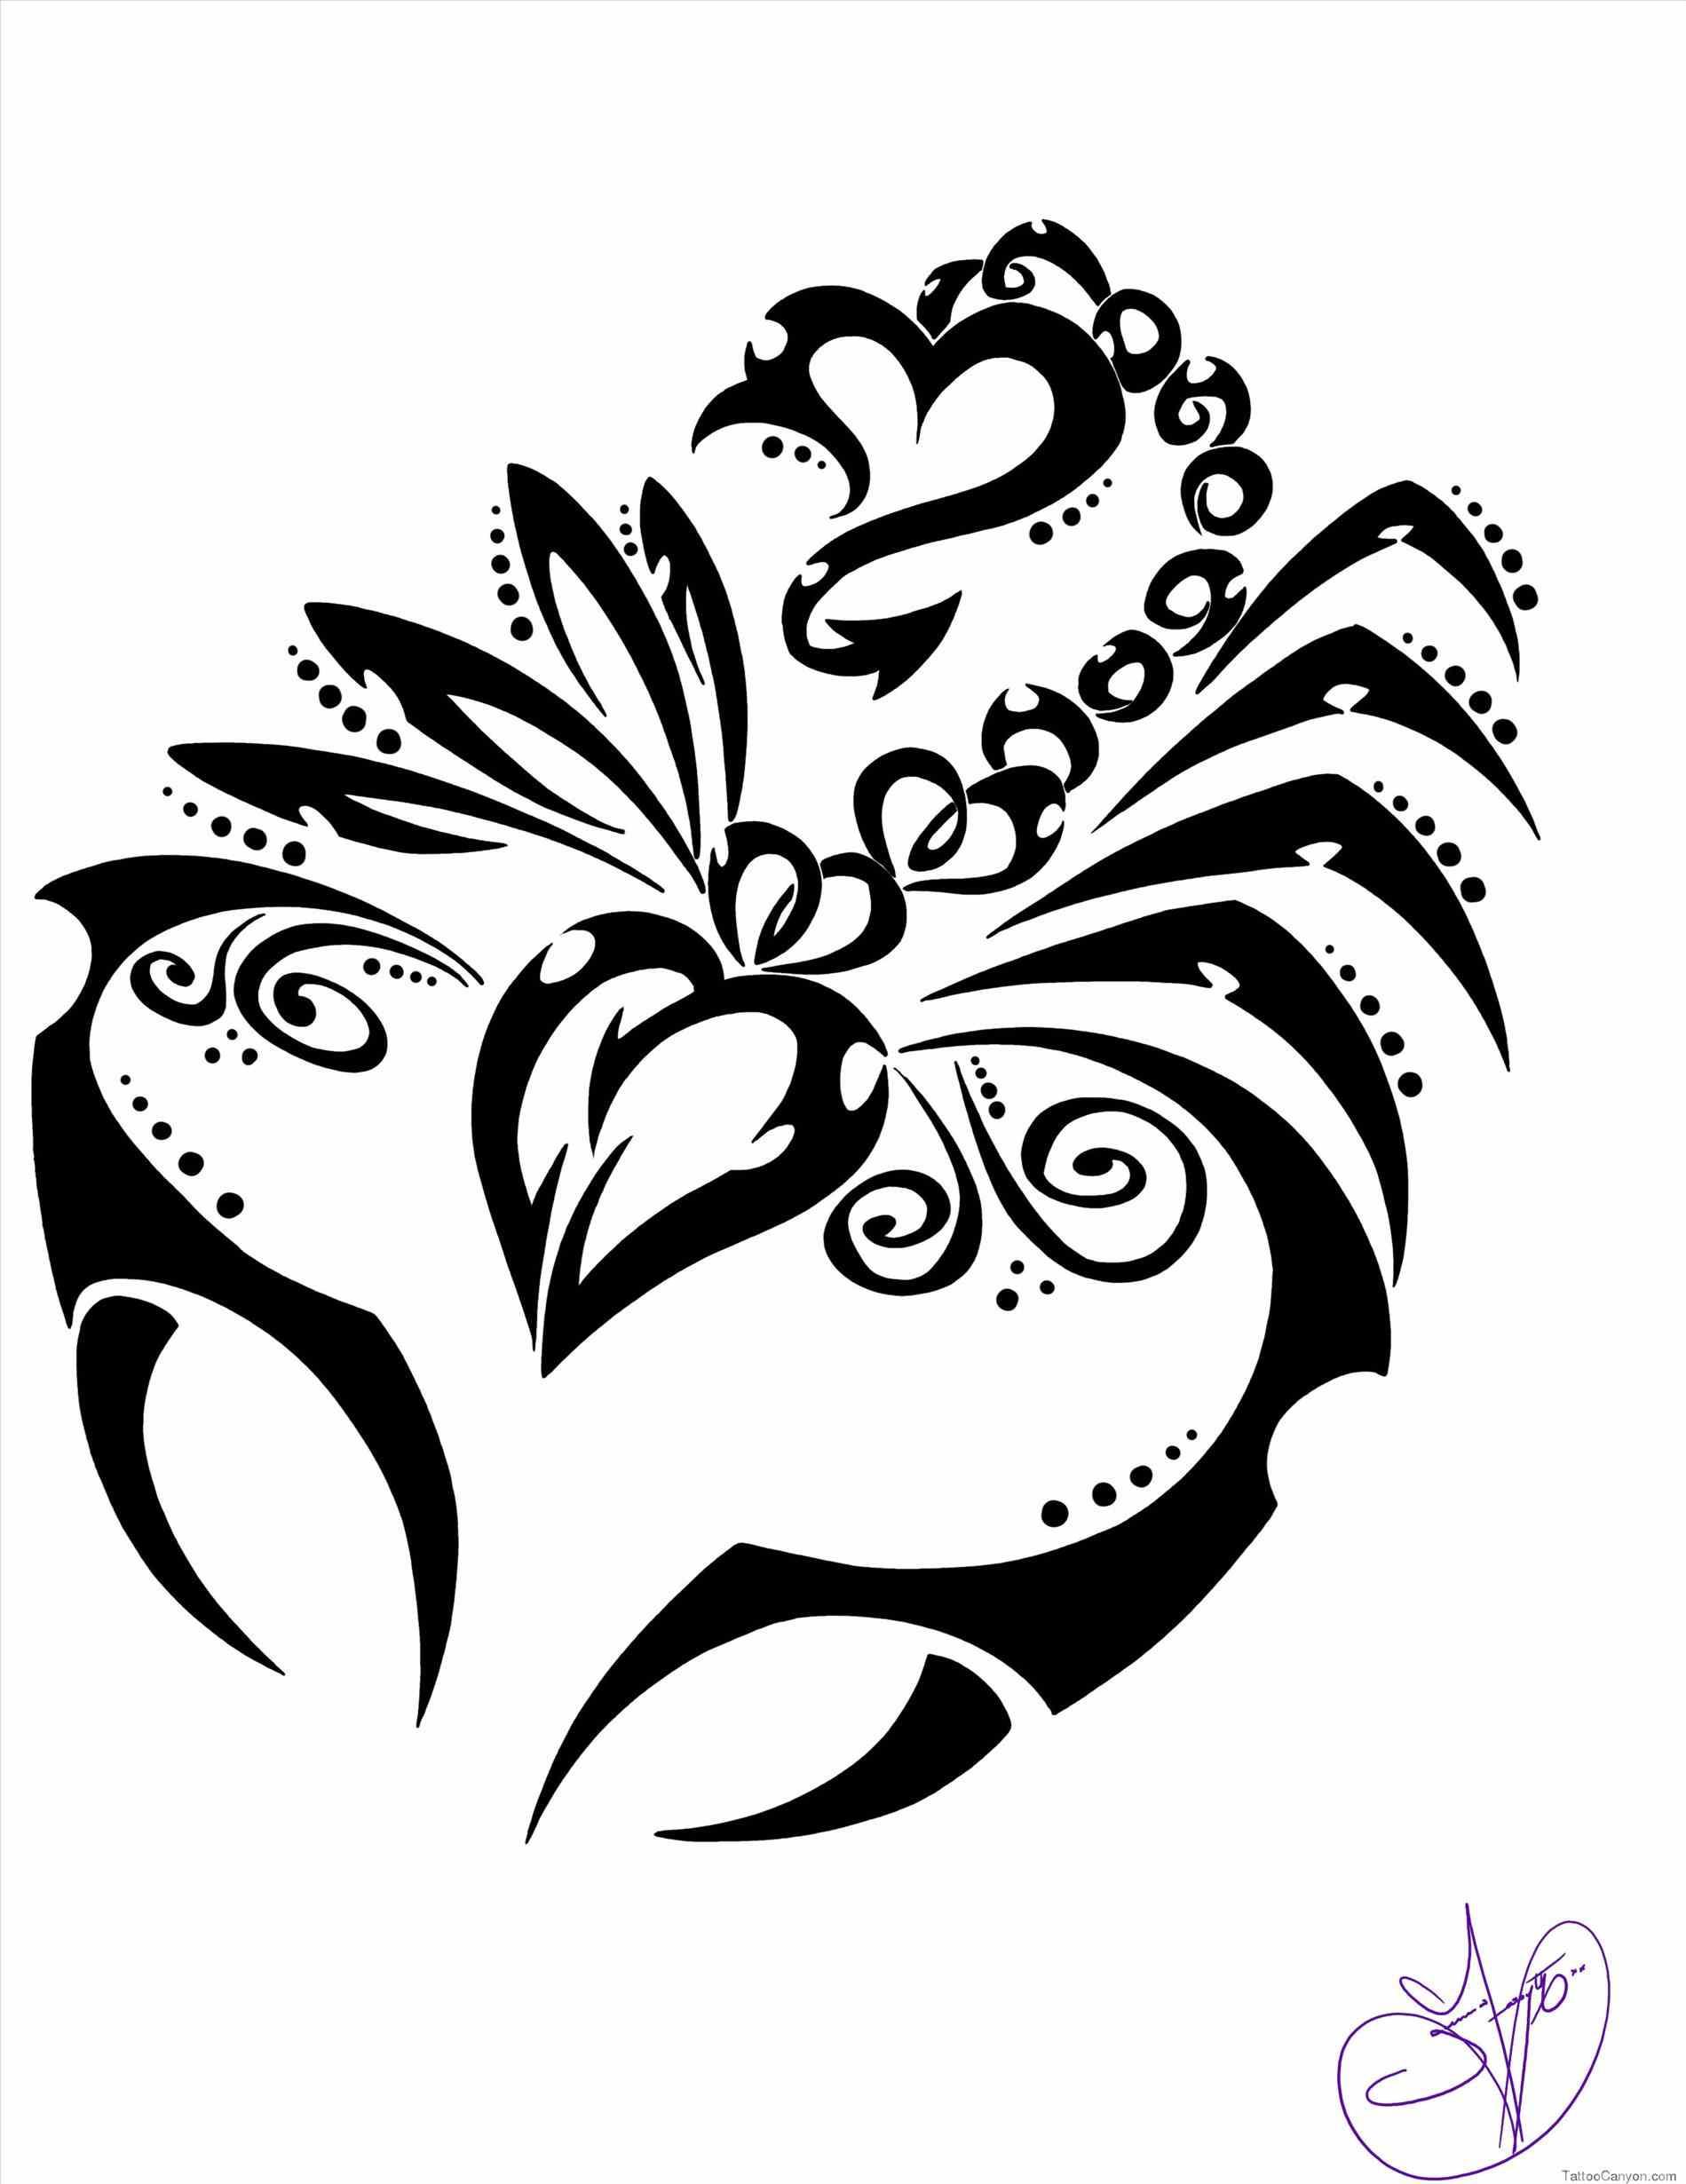 1899x2460 To Draw For Men Free Download Clip Art Scorpion Tattootattoo